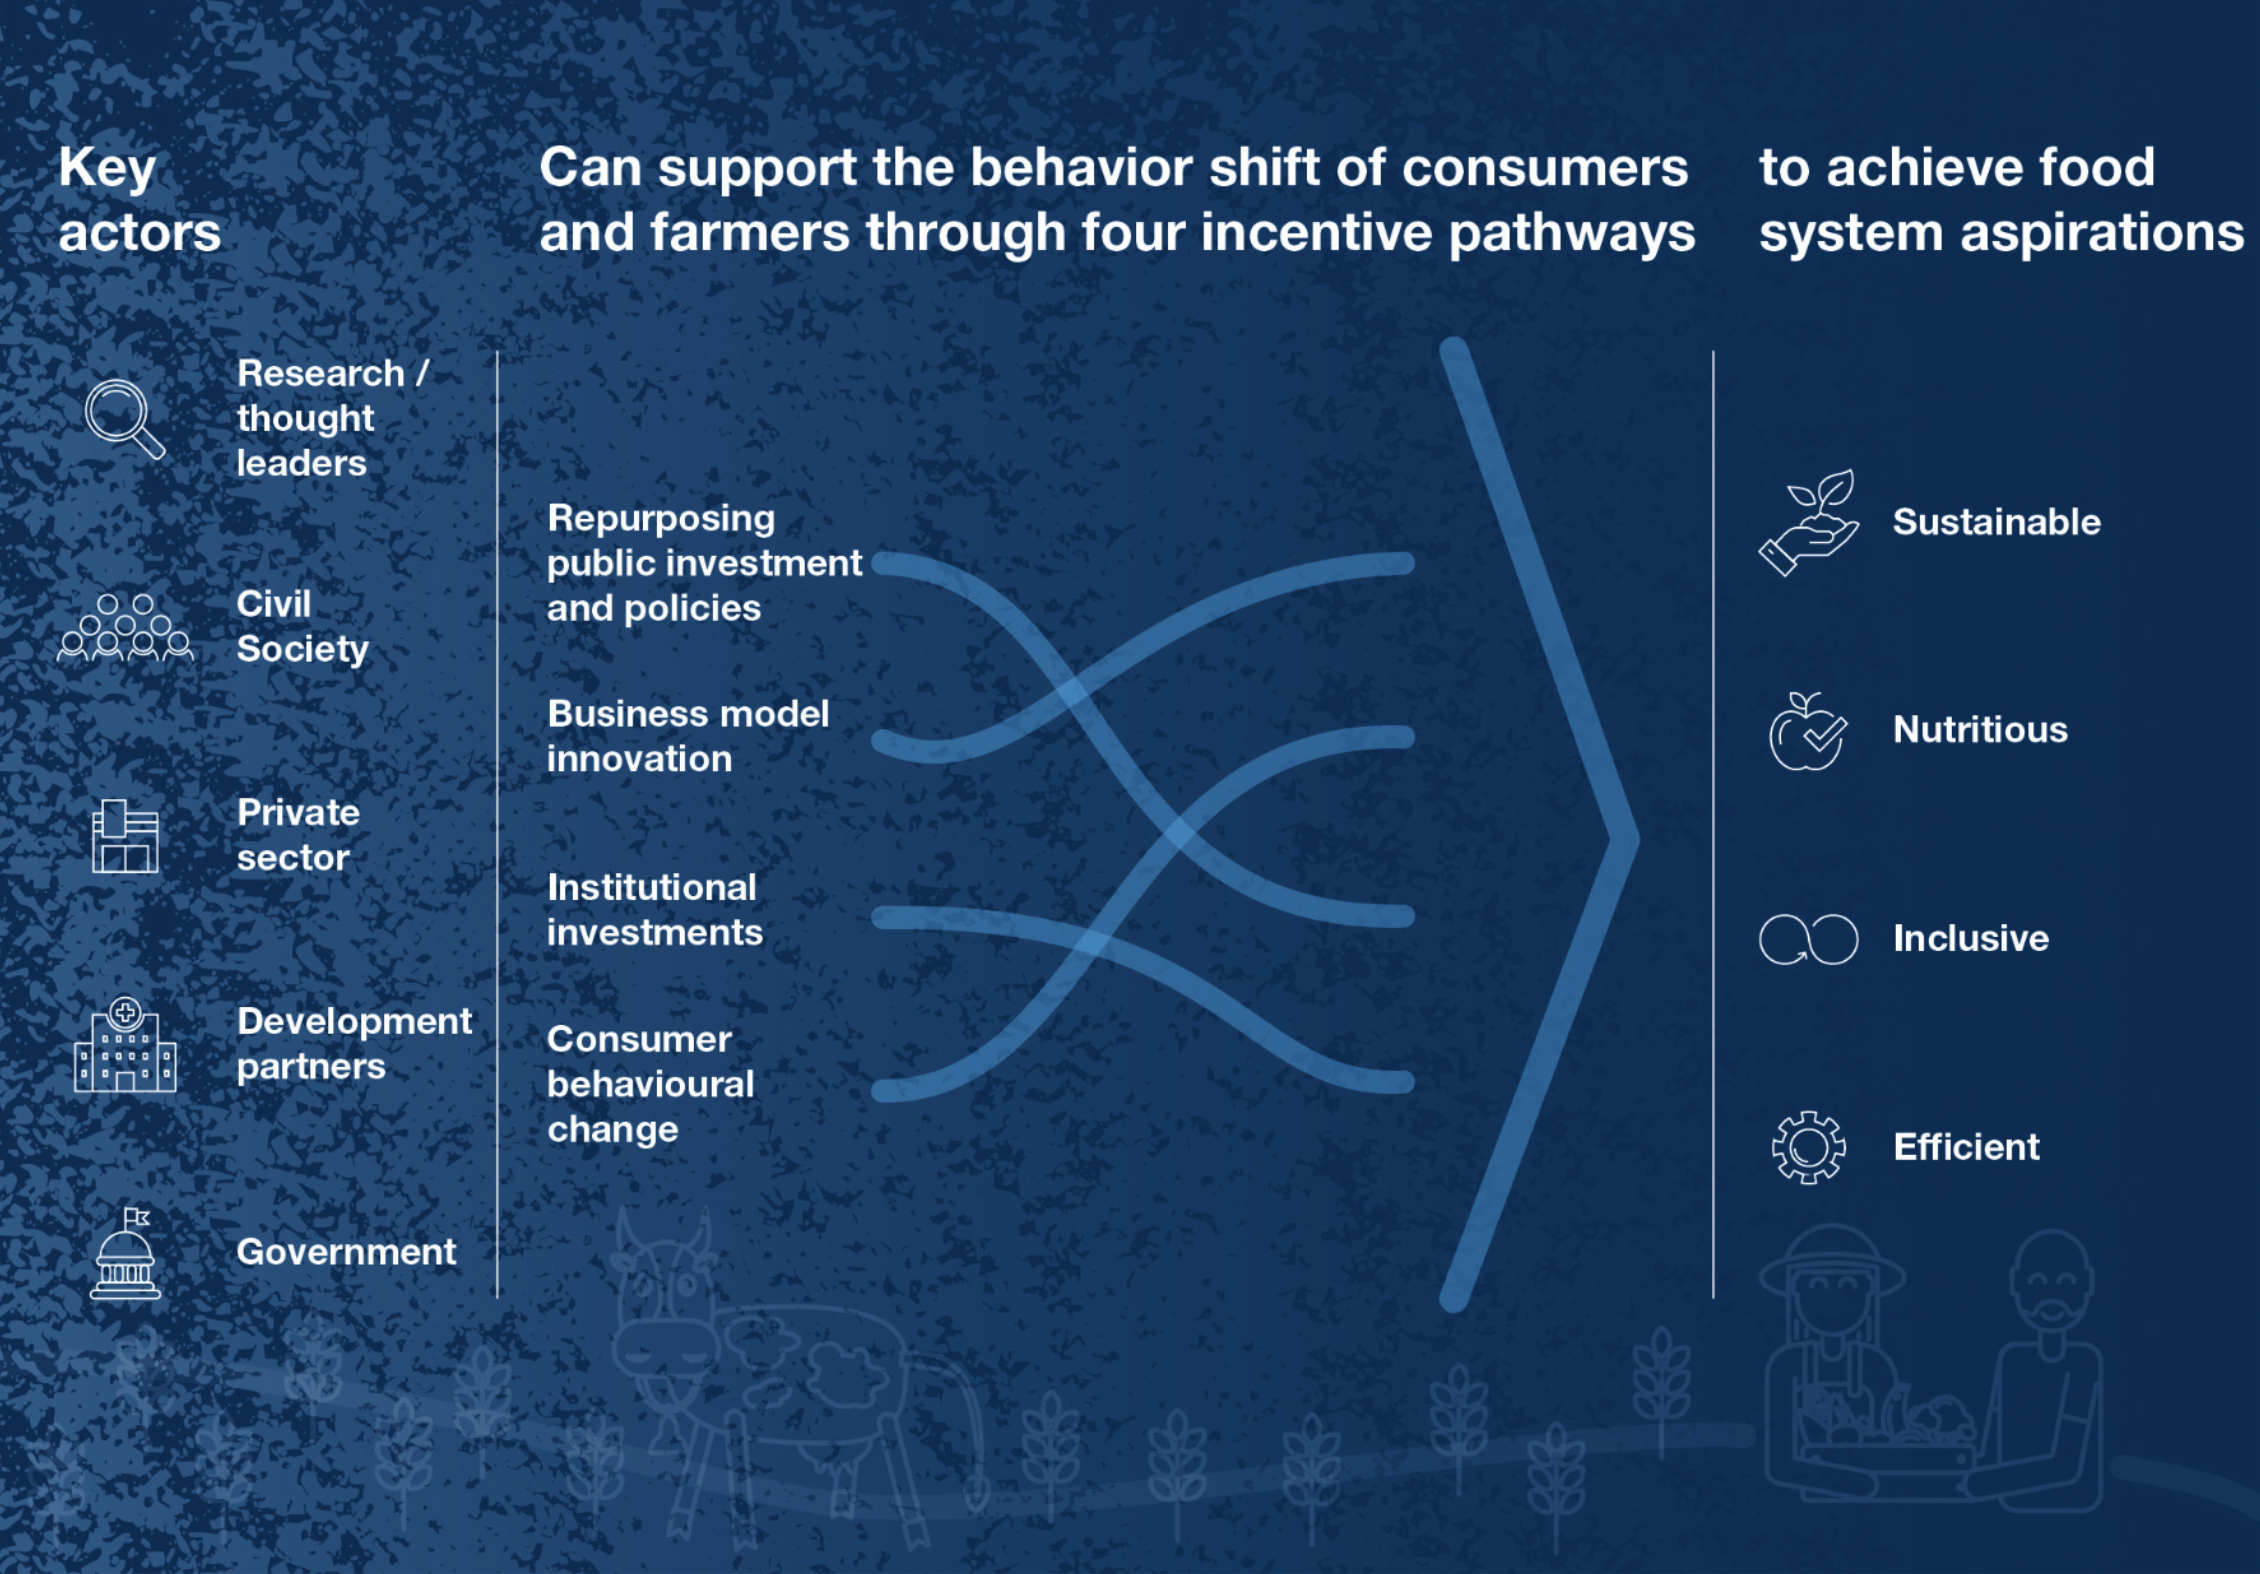 A roadmap for incentivizing change